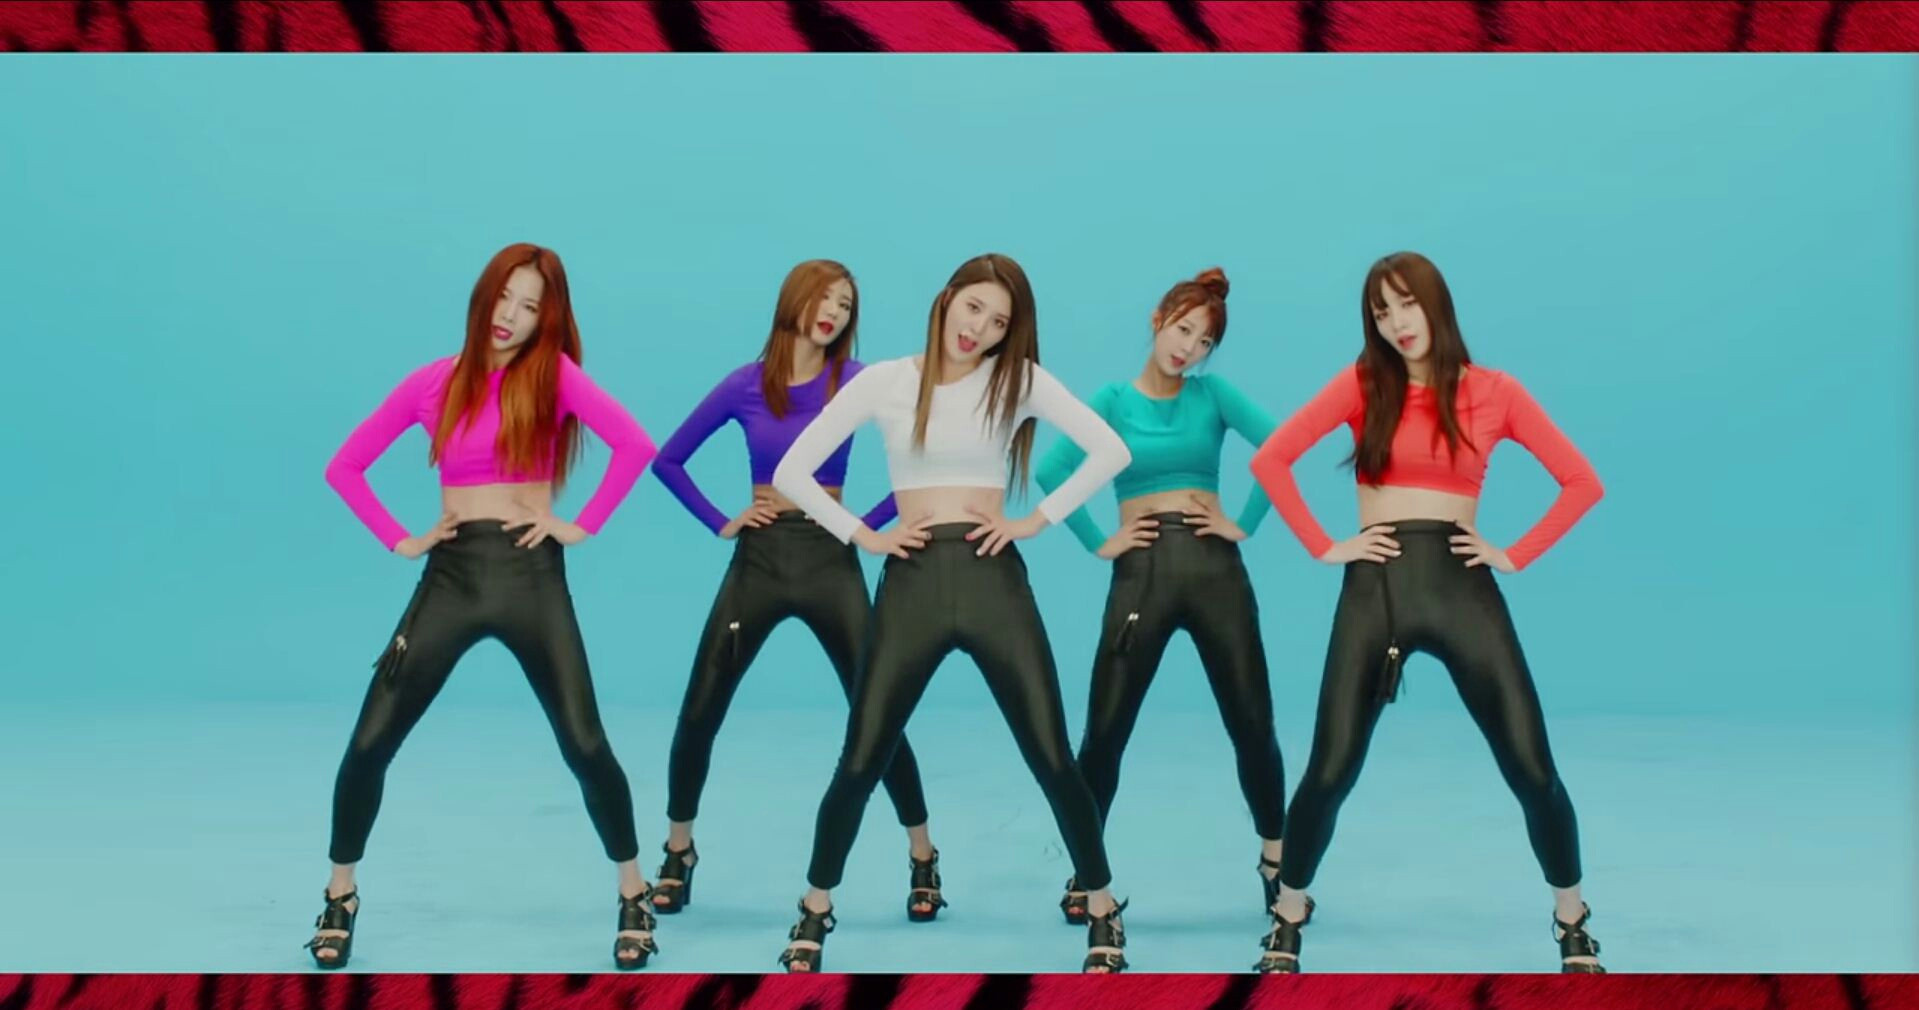 #2.EXID_UP&DOWN 帶著EXID一路從音源百名以外衝向音樂節目第一的UP&DOWN 絕對是今年必聽的「神曲」之一,後續曲《Ah Yeah》和新專輯《HOT PINK》 三首曲子都獲得音樂節目的第一名,更是寫下繼2NE1和少女時代後的新紀錄